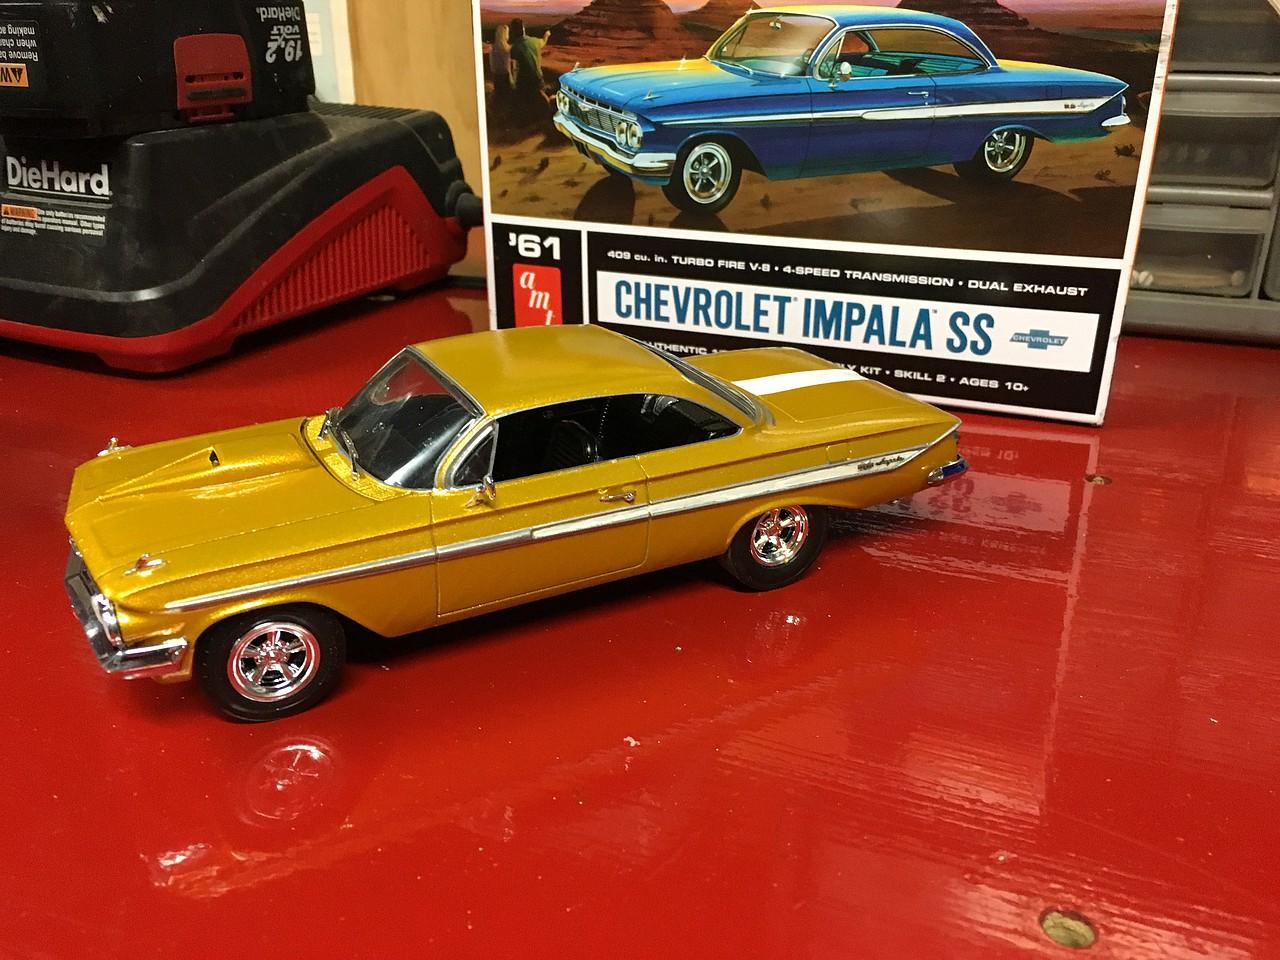 Amt 1961 Chevy Impala Ss Plastic Model Car Kit 1 25 Scale 1013 12